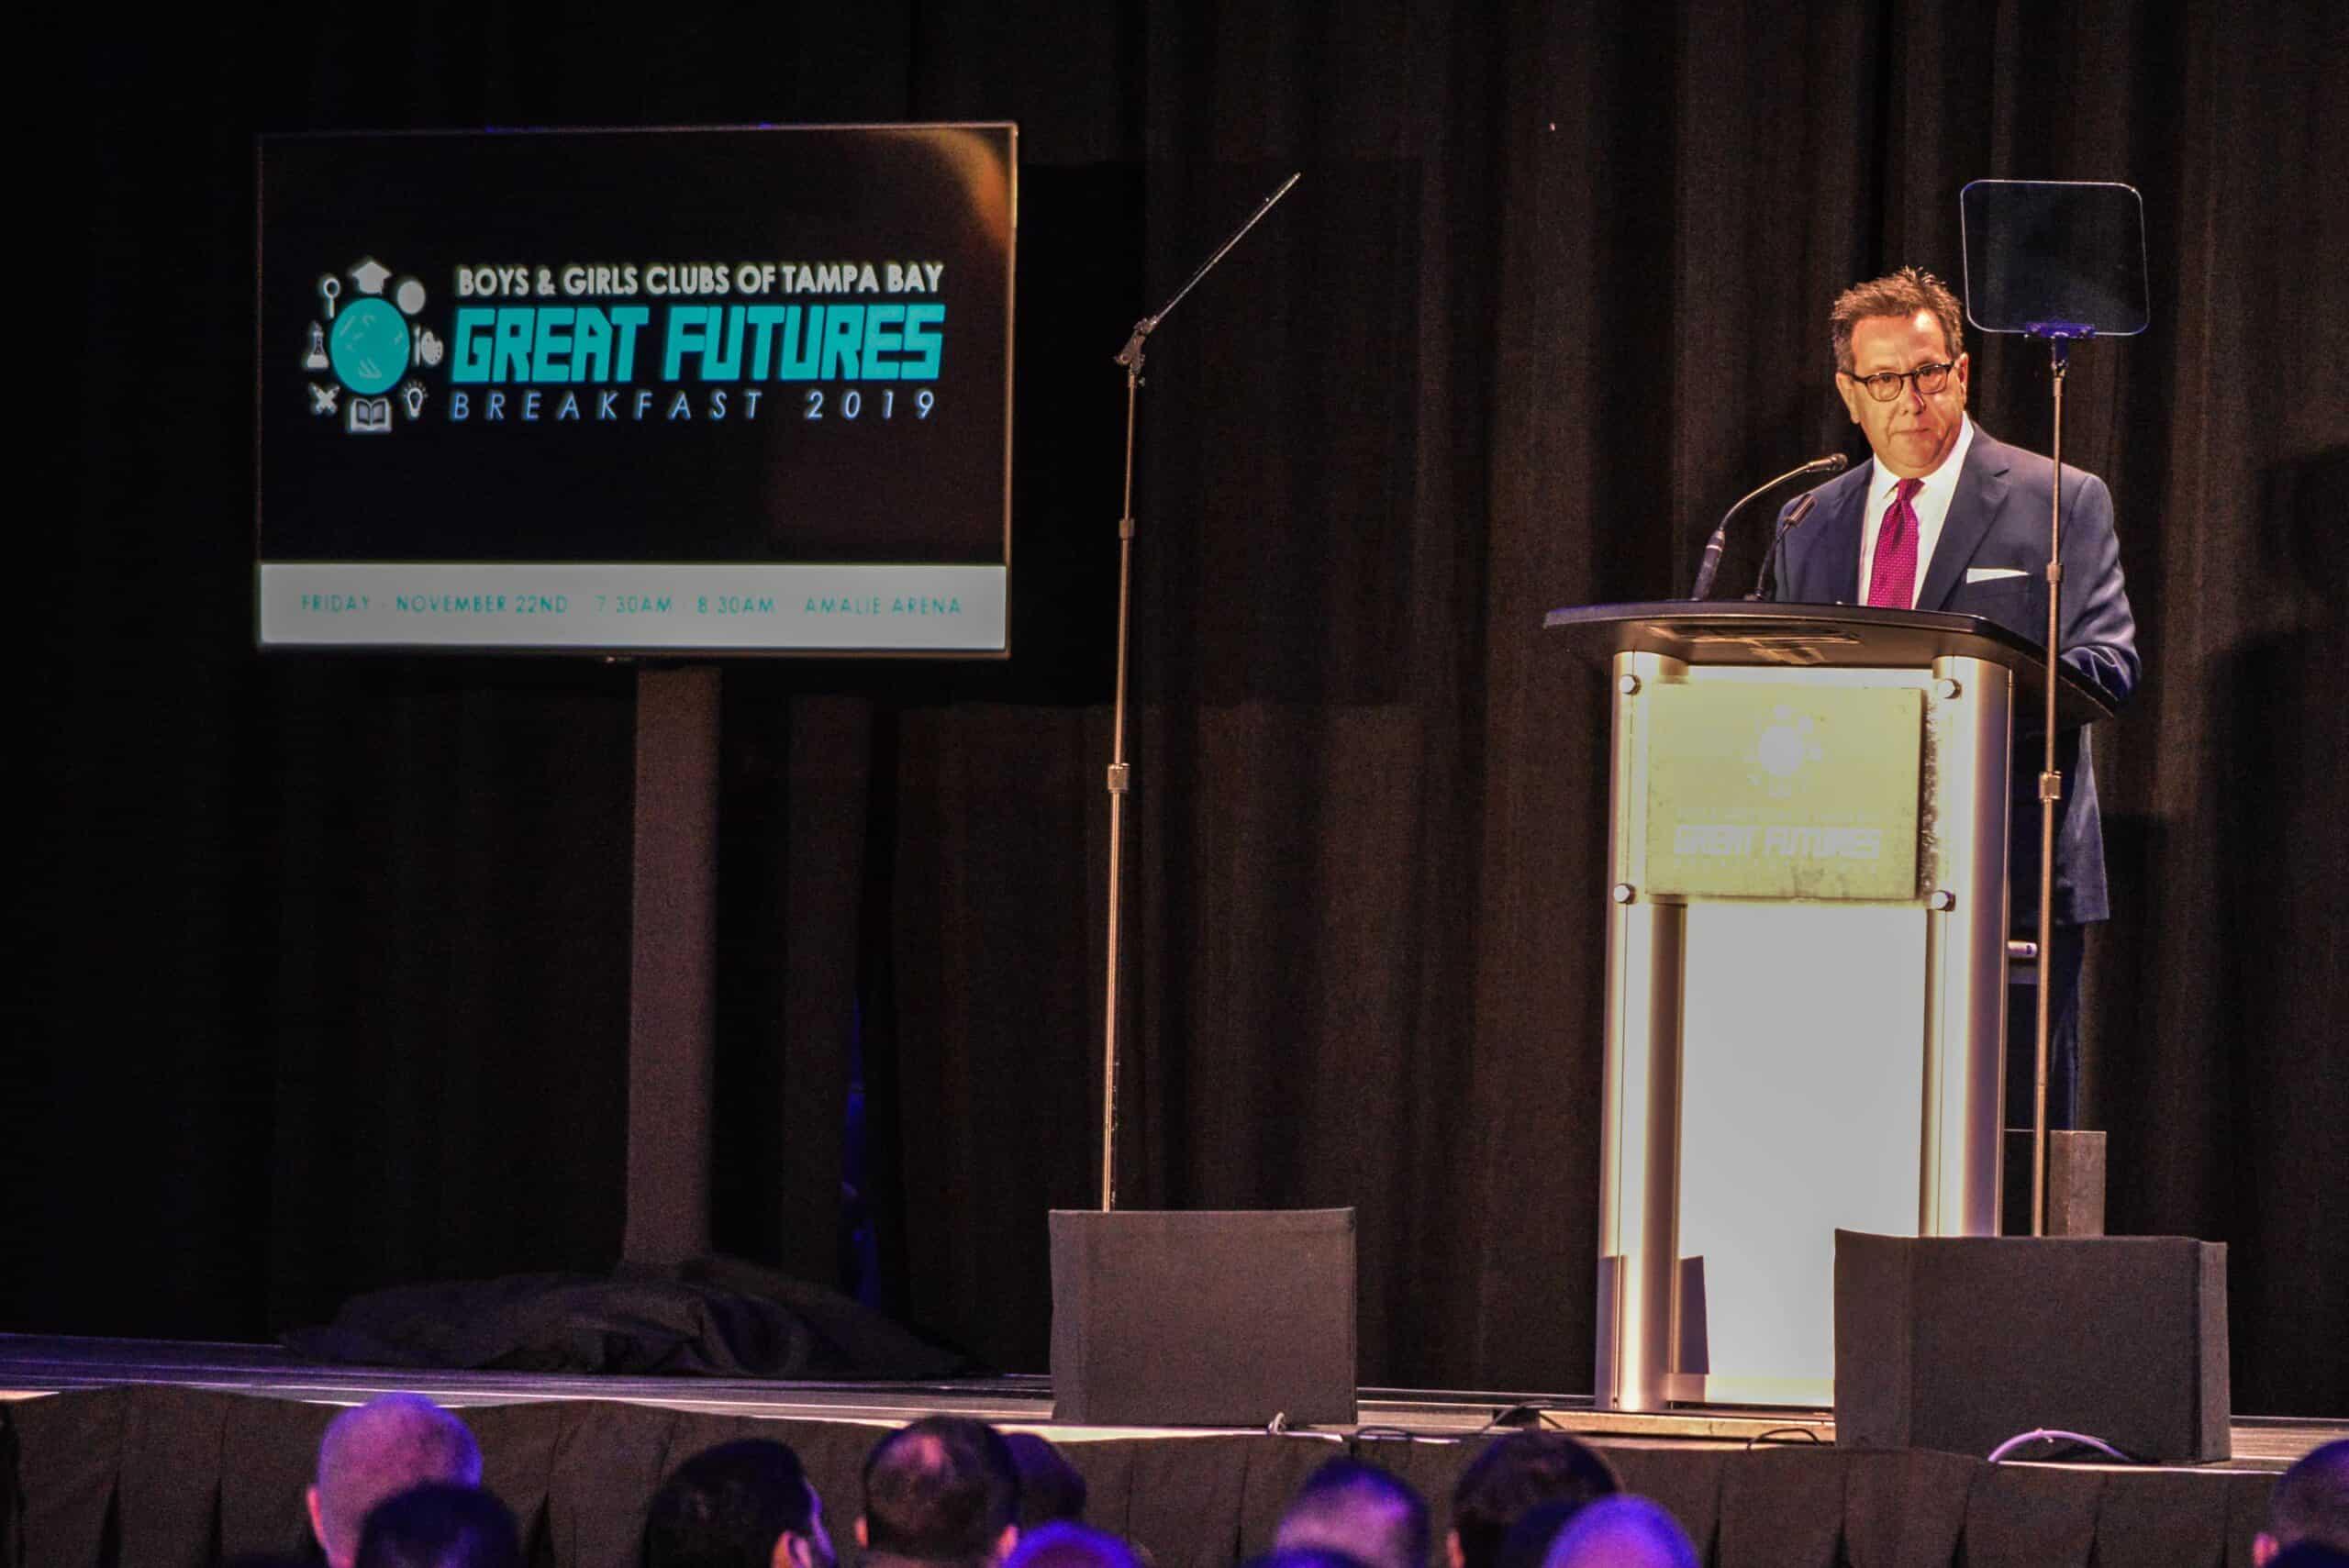 Reggie Garcia at the Great Futures Breakfast